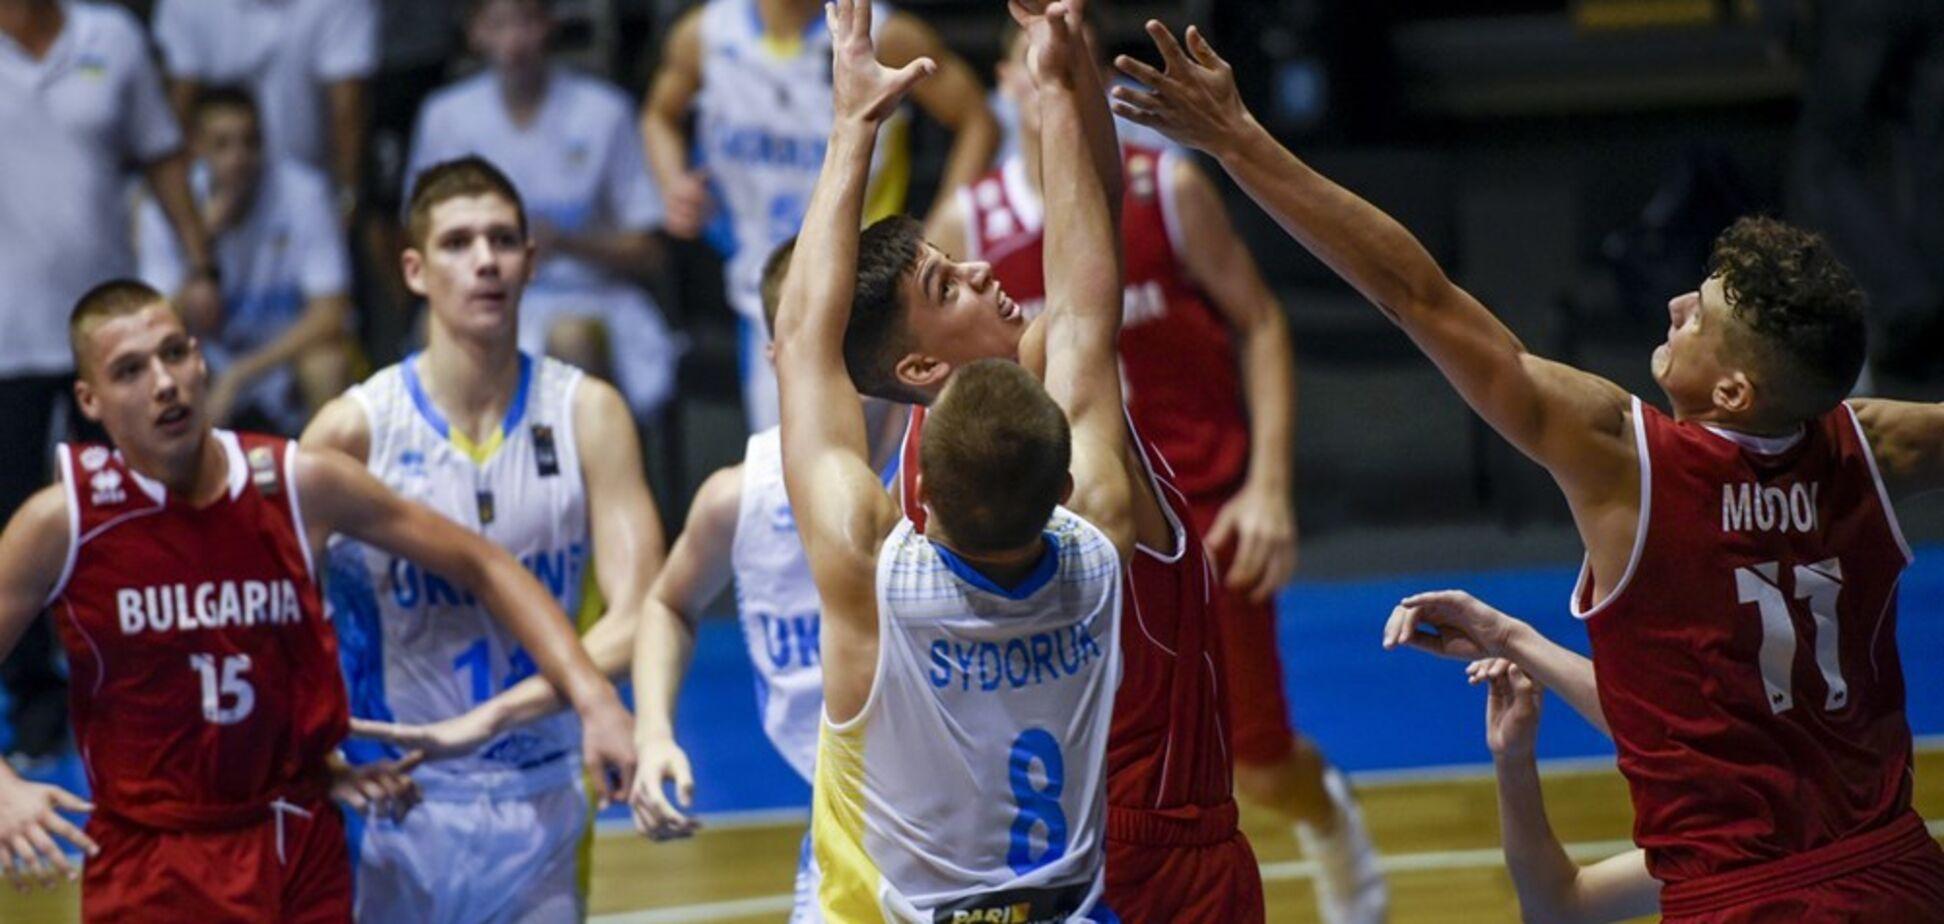 Кадетська збірна України з баскетболу